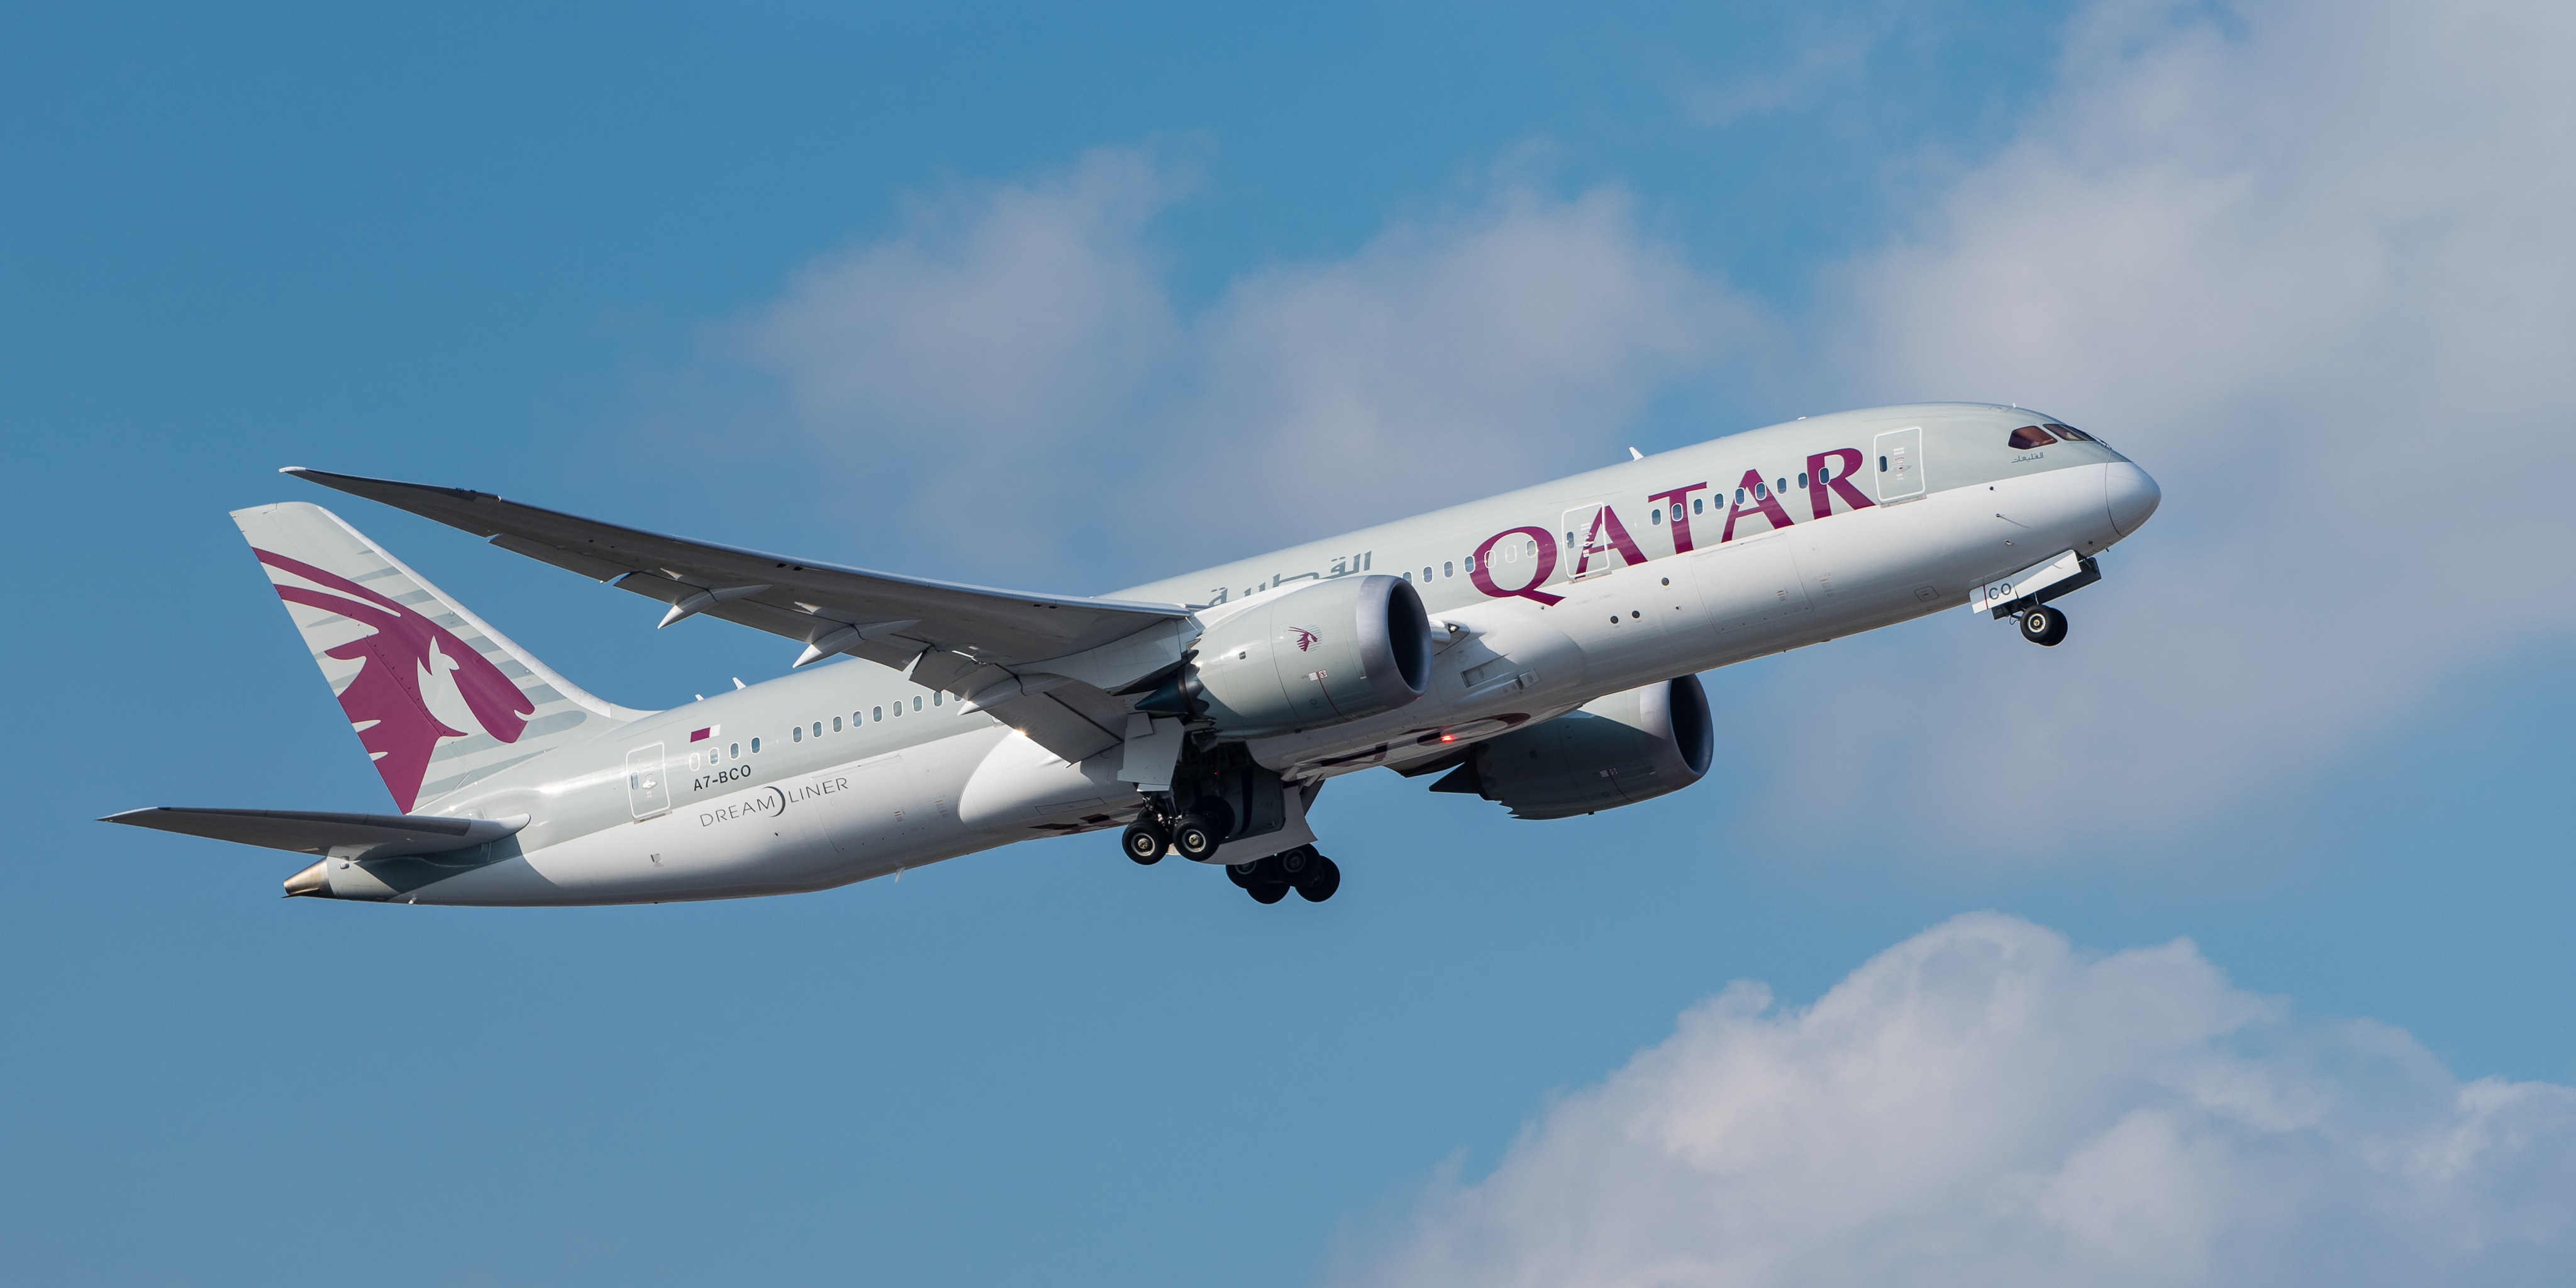 UPDATE 1-Qatar Airways in talks to buy 49% RwandAir stake, interested in increasing LATAM investment